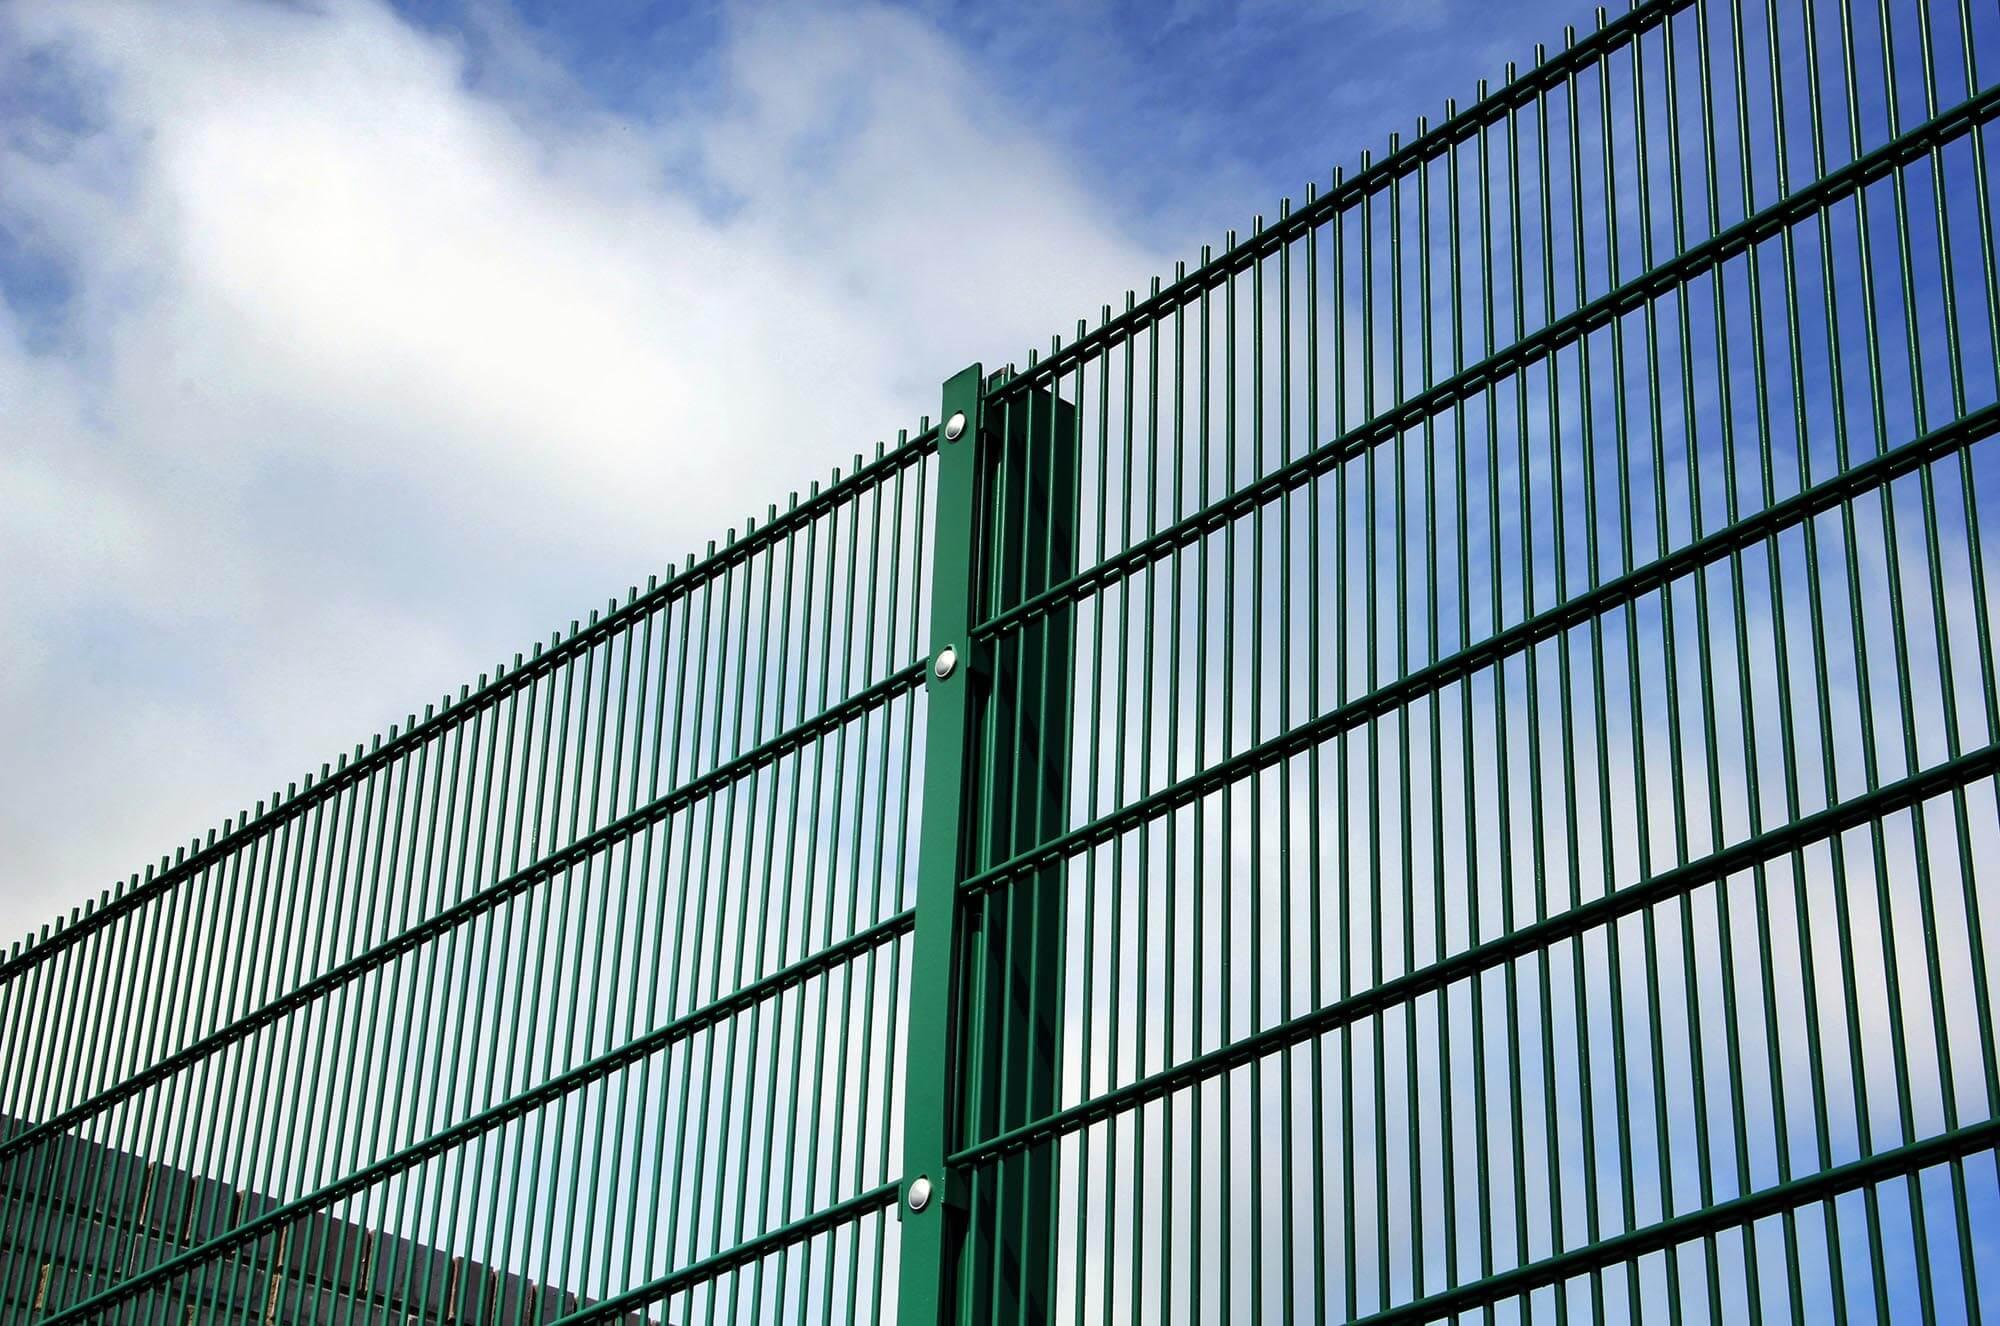 Double-Wire-Rigid-Mesh-High-Security-Fencing-LPS1175-Dulok-25-SR1